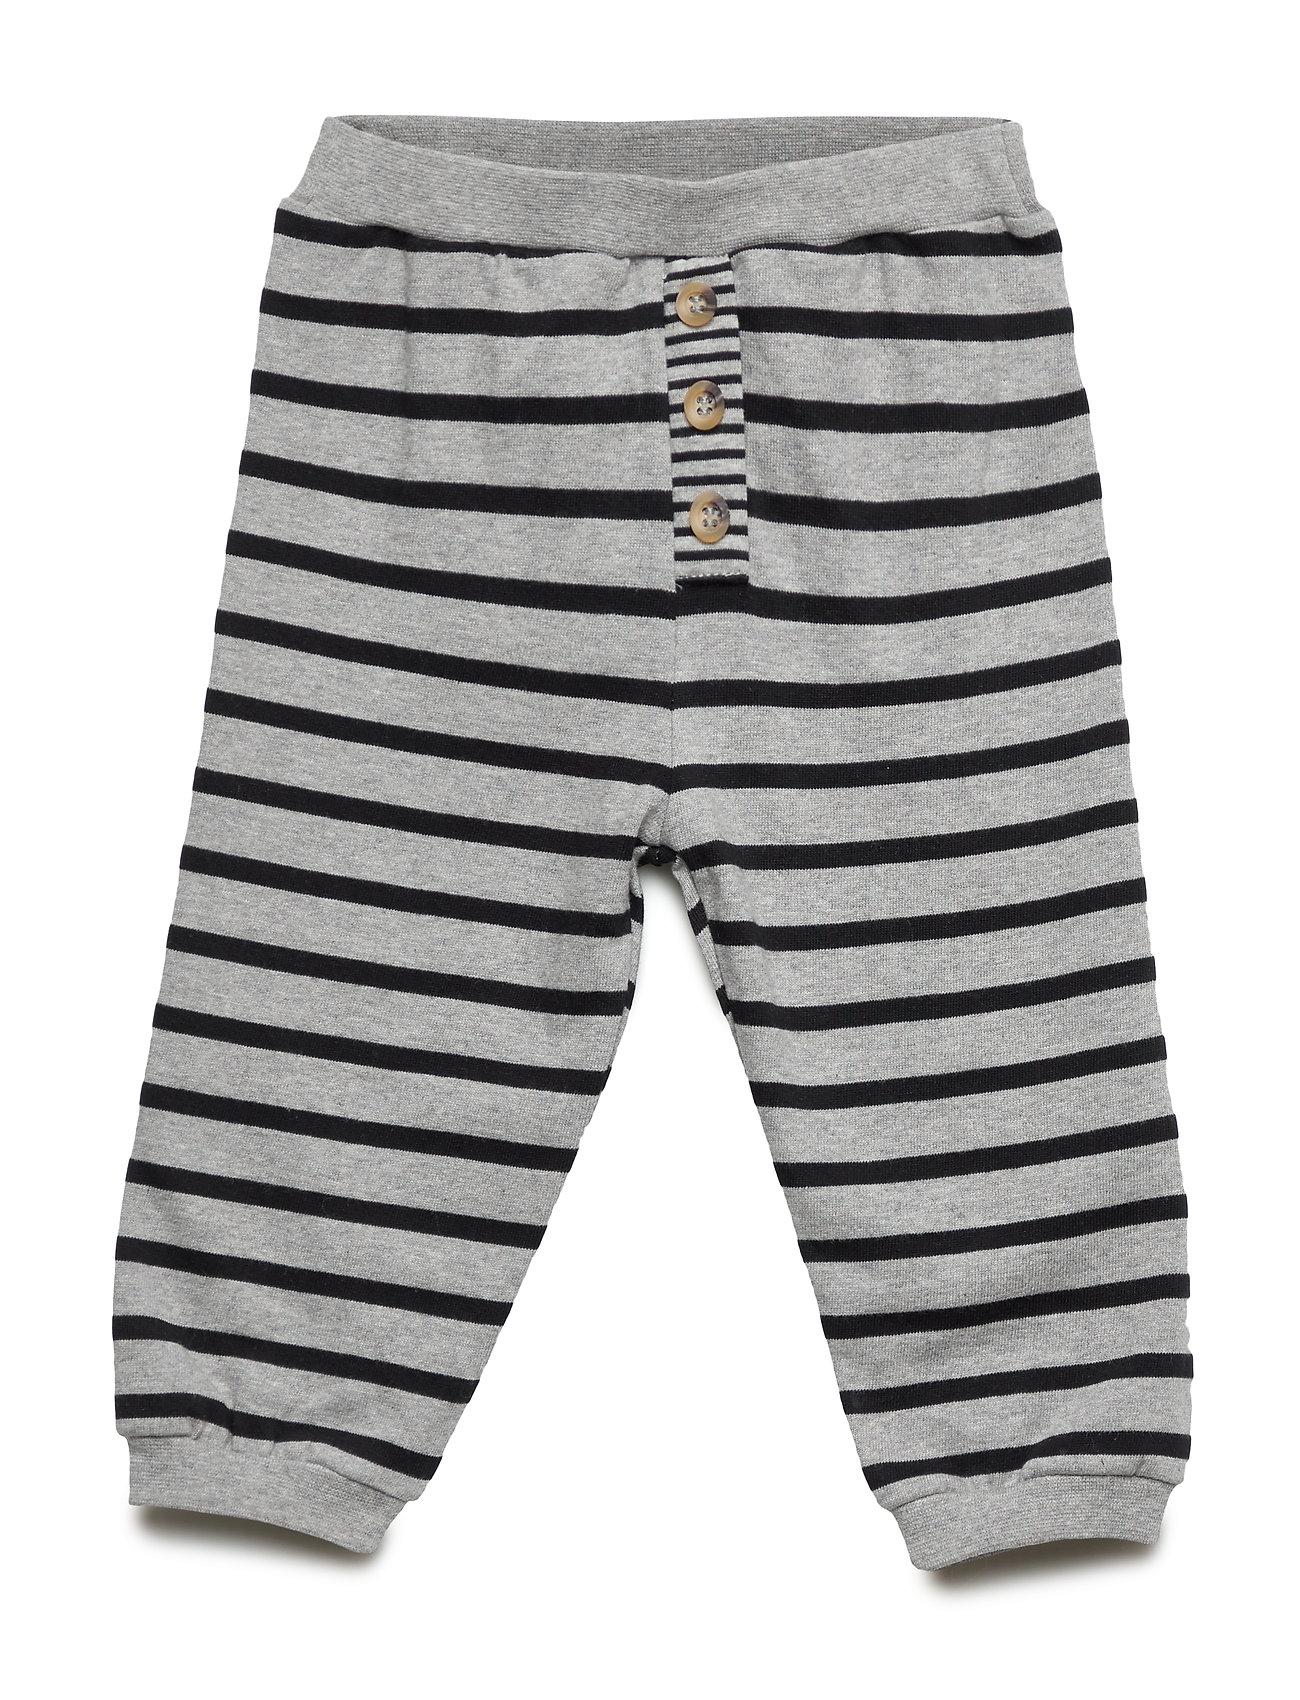 Image of Trousers Bukser Grå Noa Noa Miniature (3220493315)